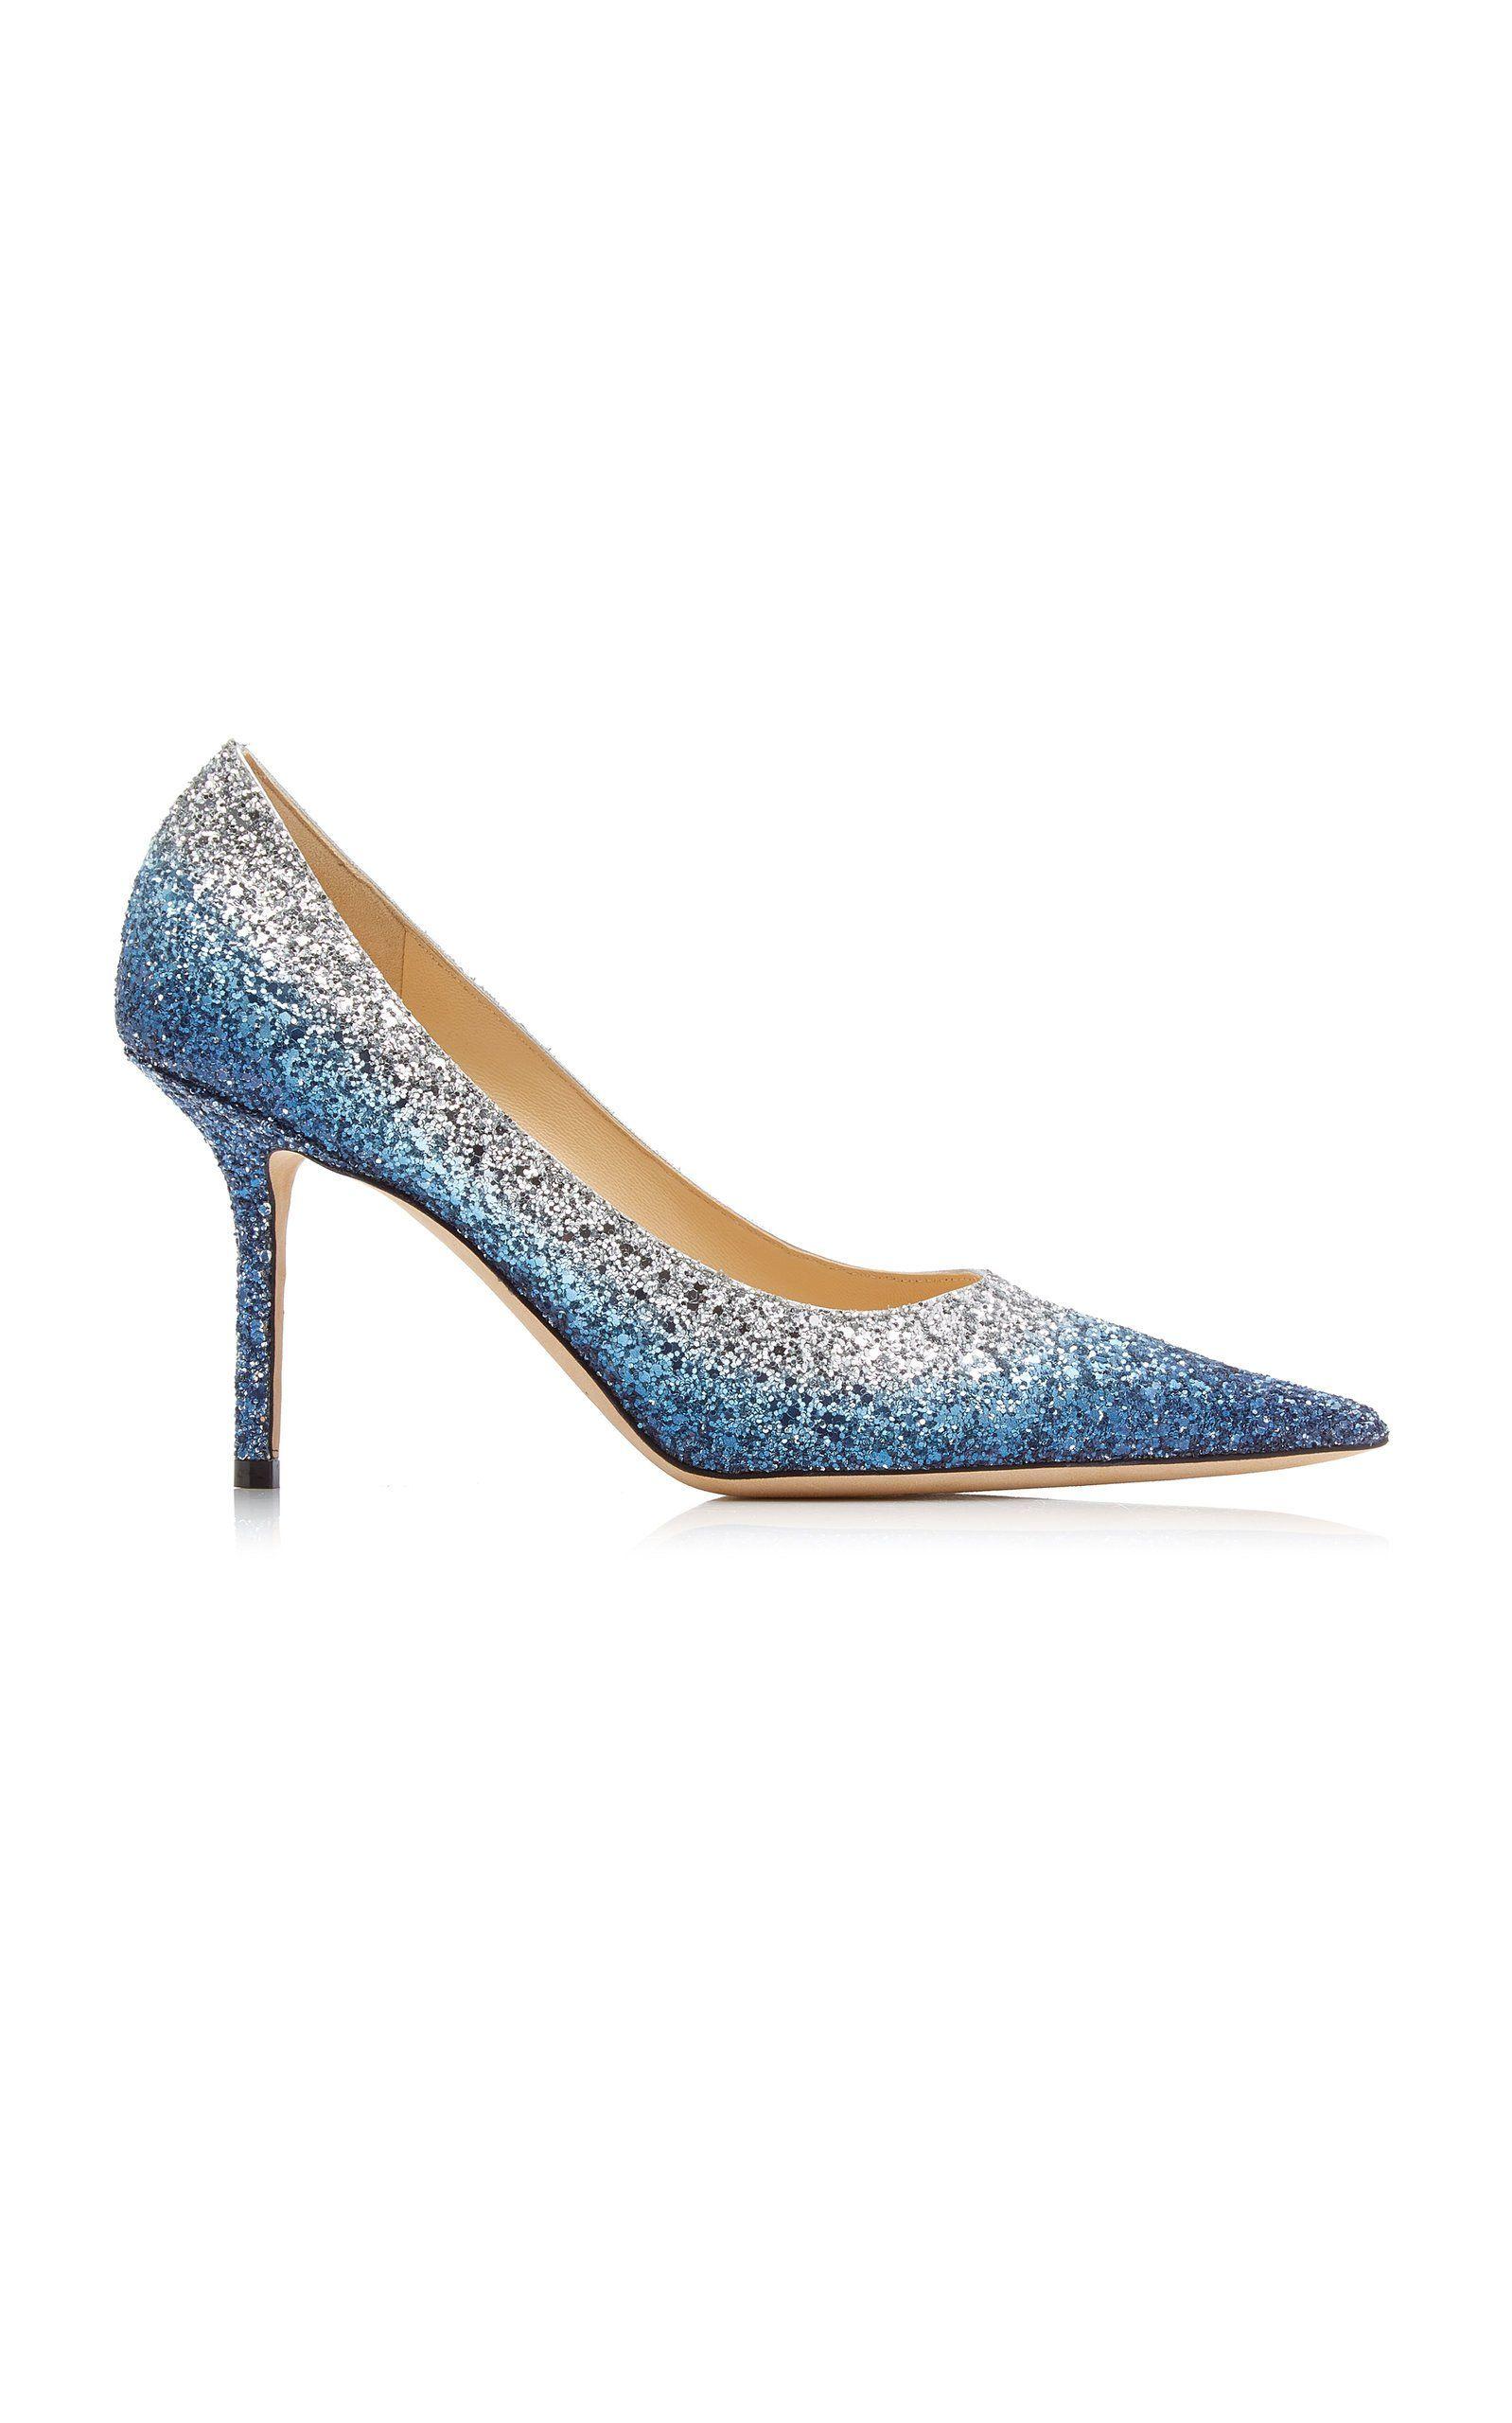 23 Blue Wedding Shoes - The Best Blue